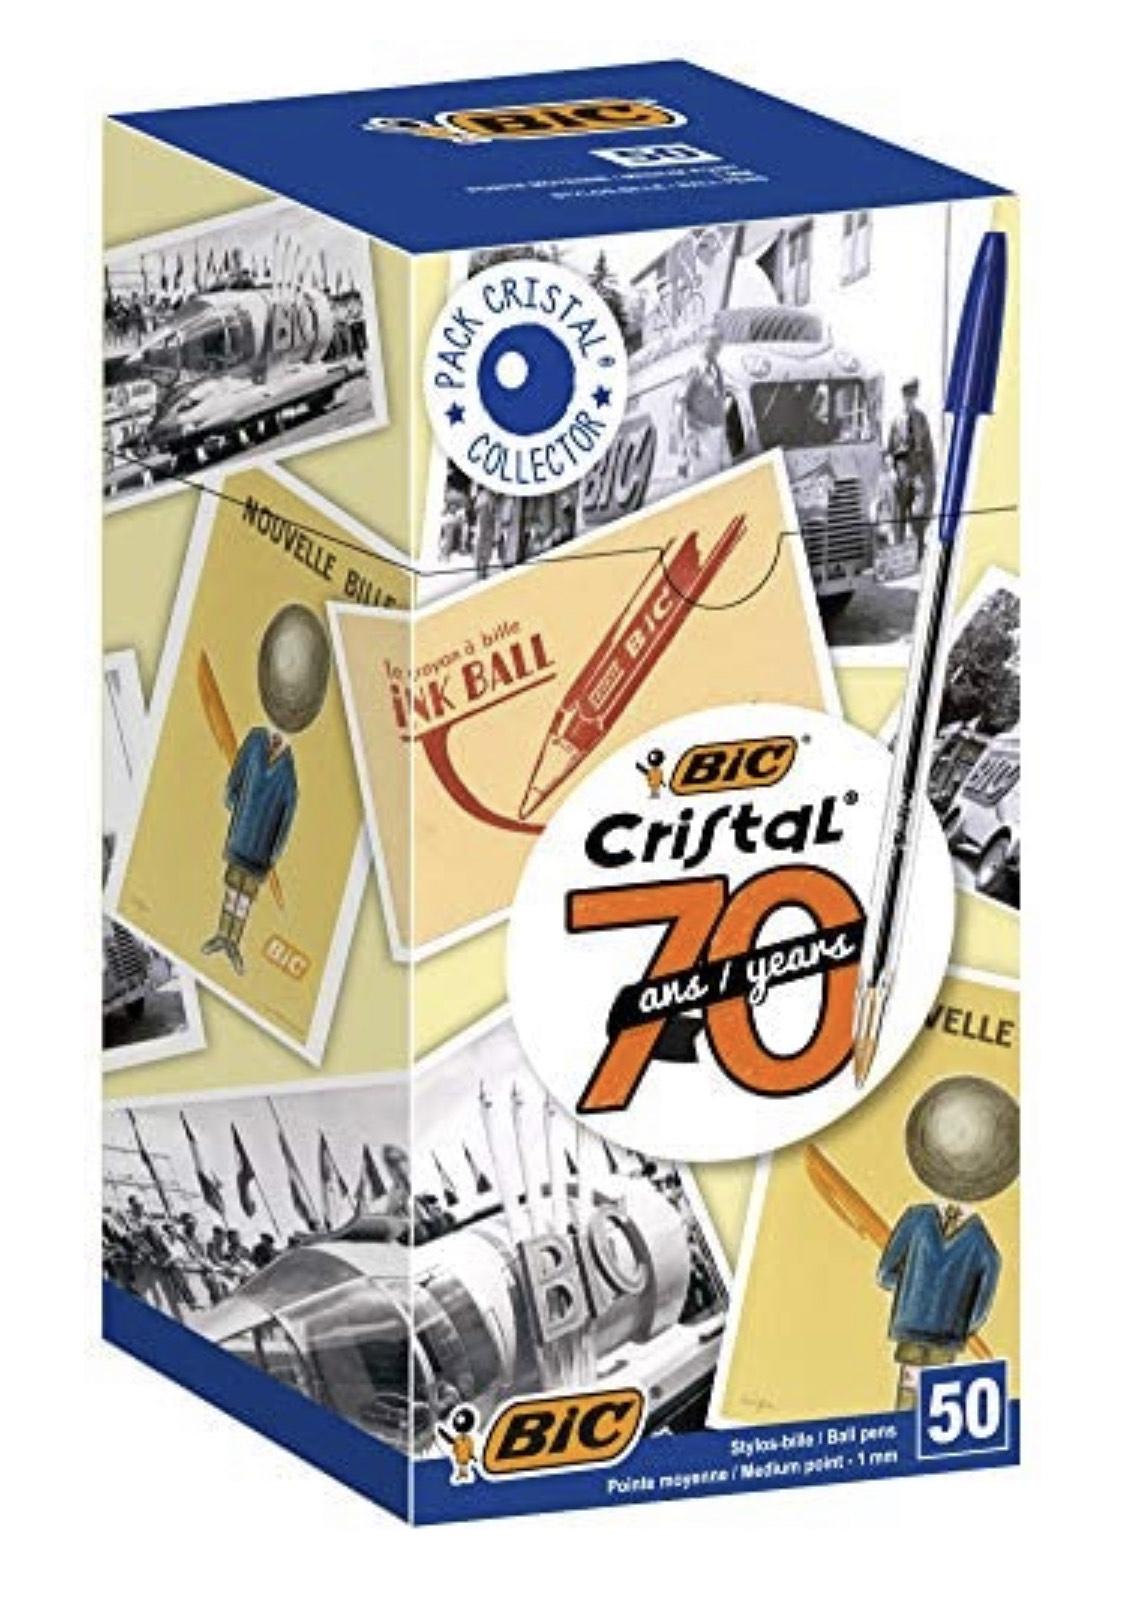 BIC Cristal 1mm Balpen (50 stuks) @ Amazon.nl